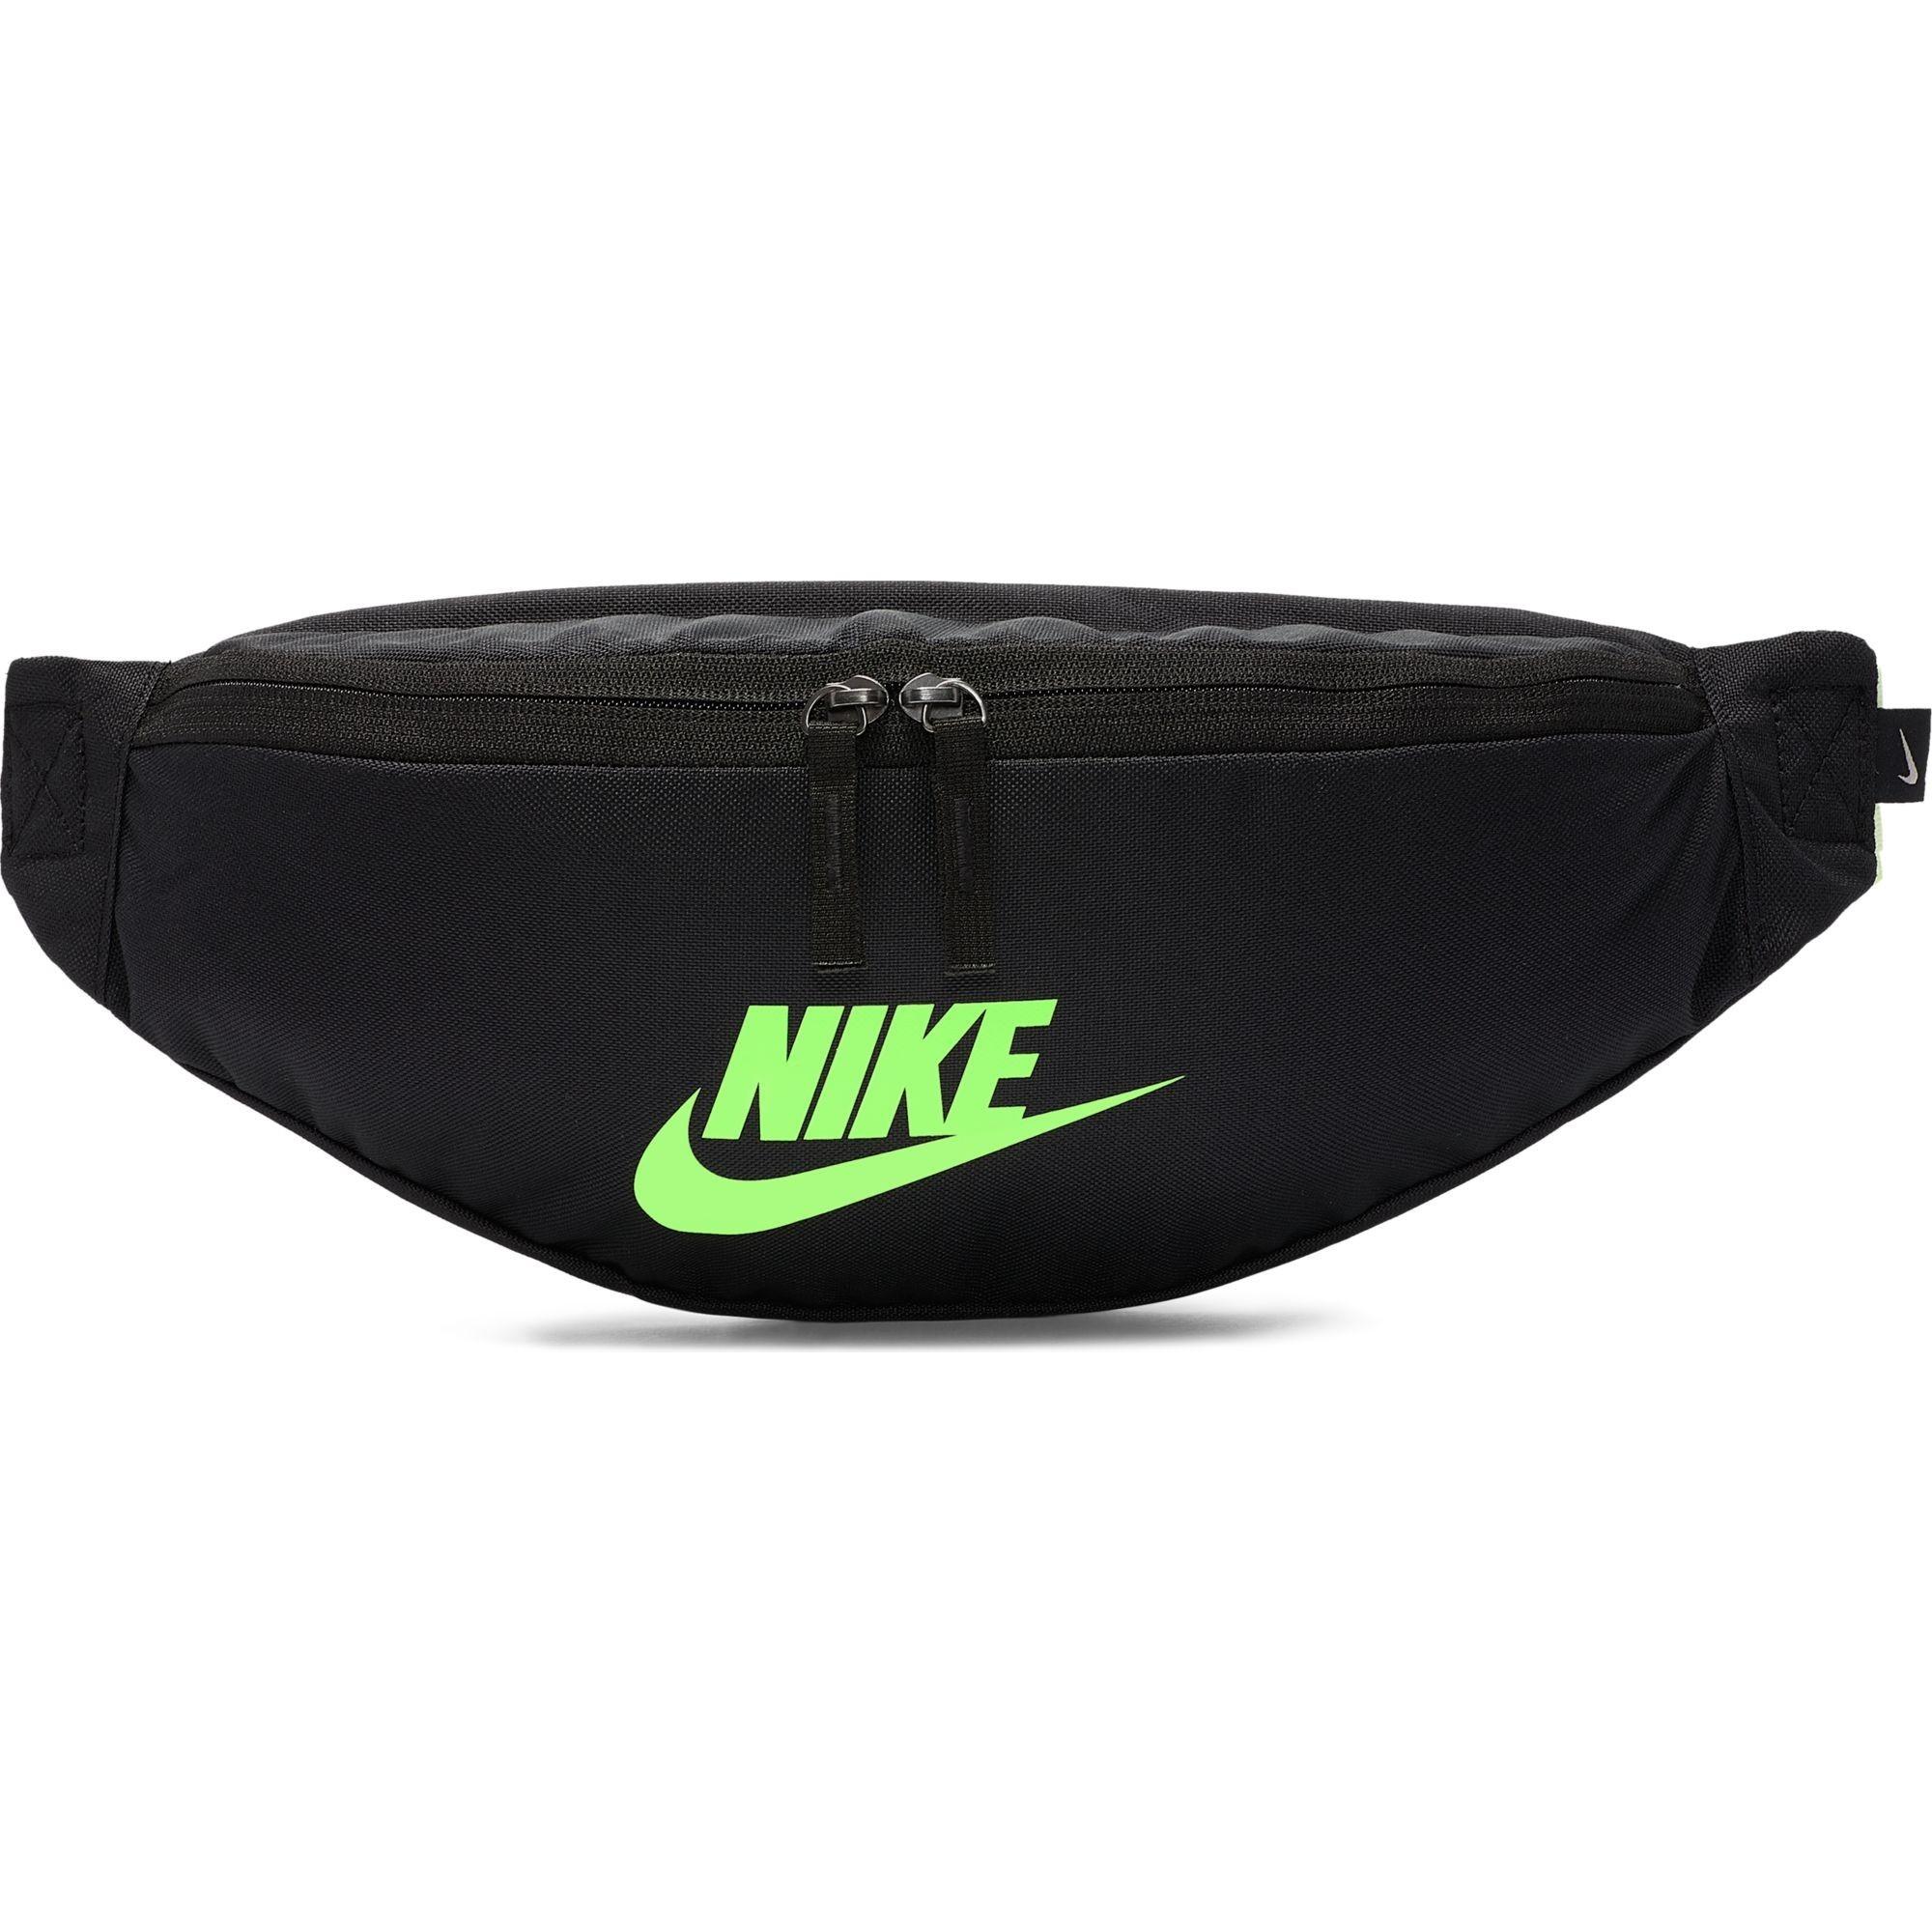 Lubricar Cintura jugar  NIKE RIÑONERA NEGRA: Riñonera Negra y verde de Nike BA5750 019|barata online